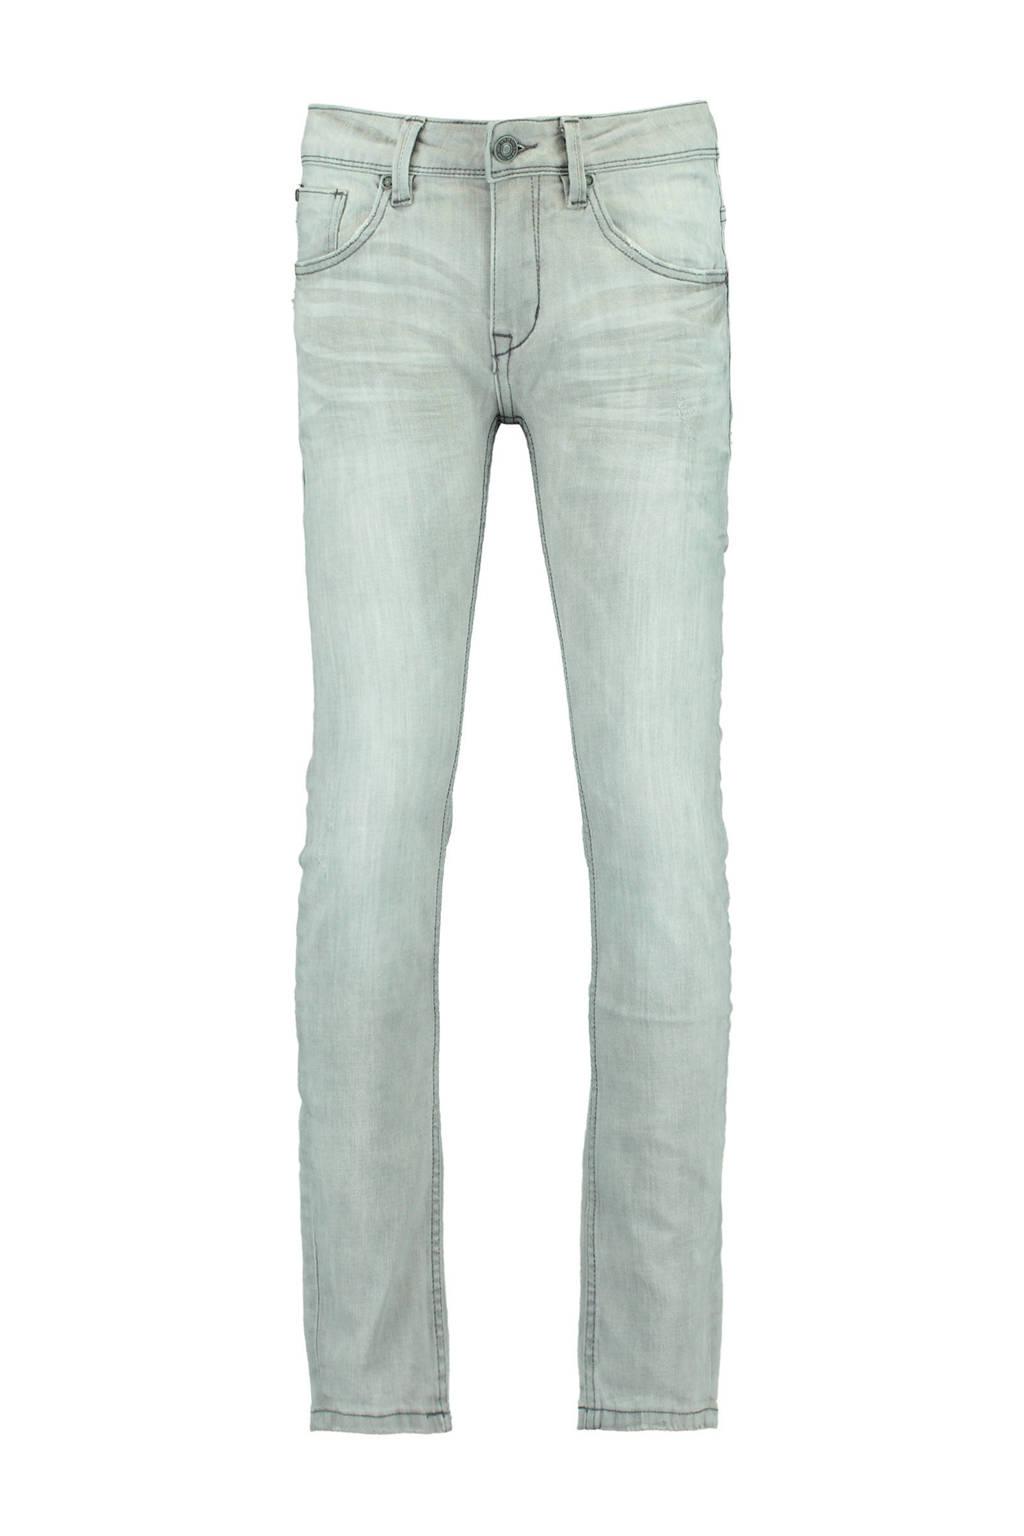 CoolCat Junior slim fit jeans Kevin grijs, Grijs